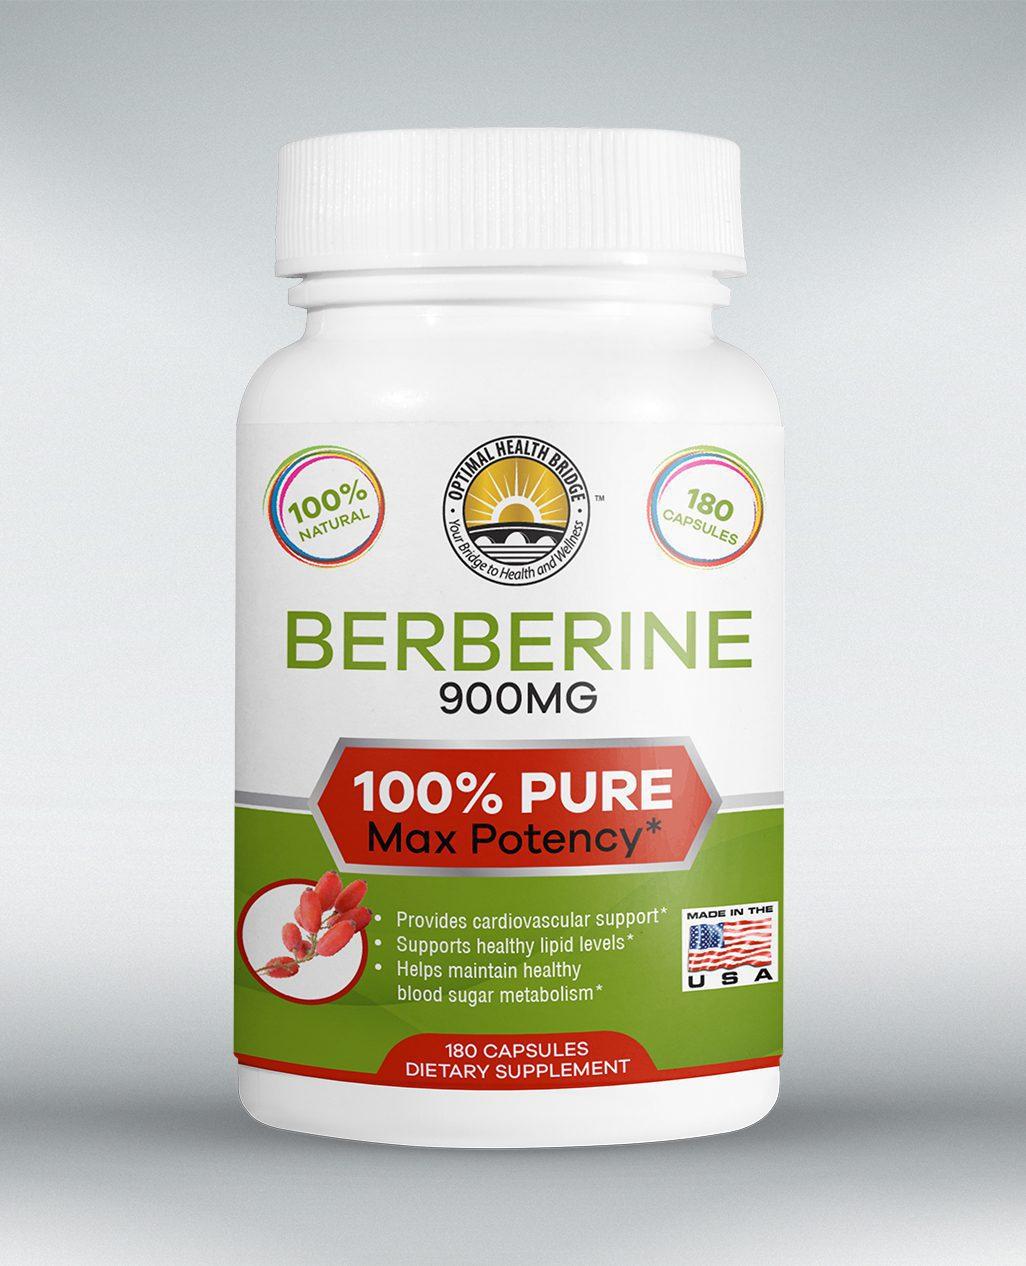 berberine bottle example